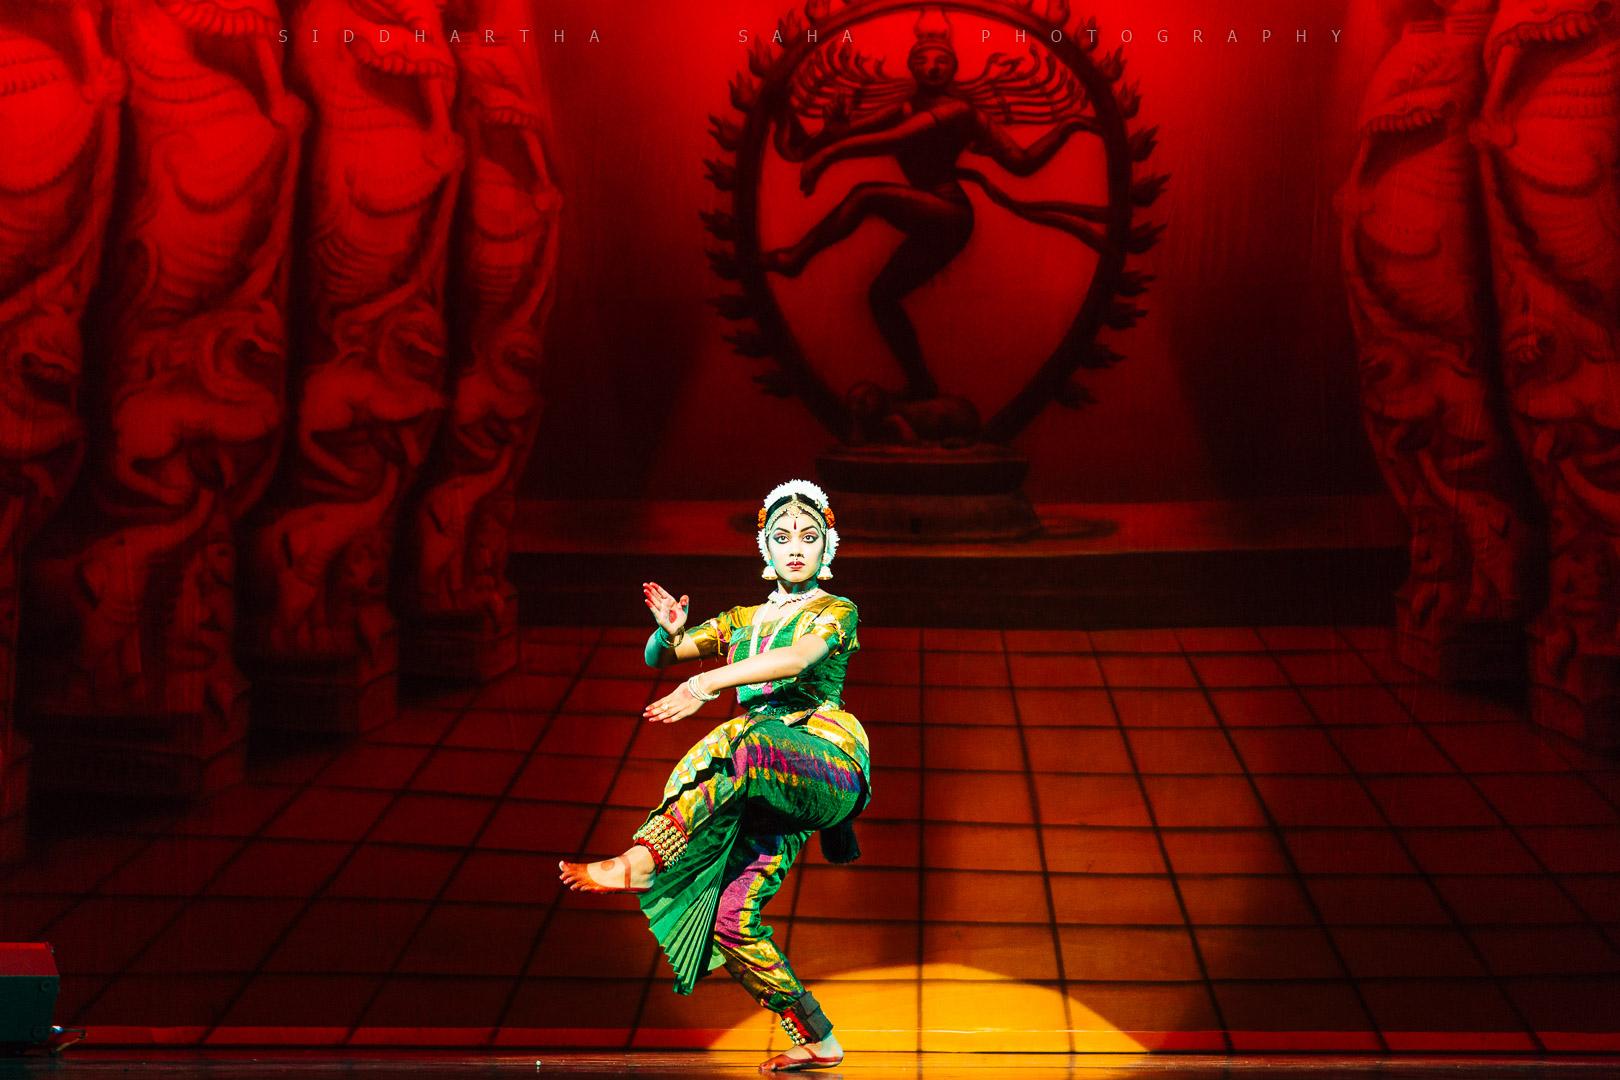 2015-09-06 - Riya Arangetram - _O5C4323